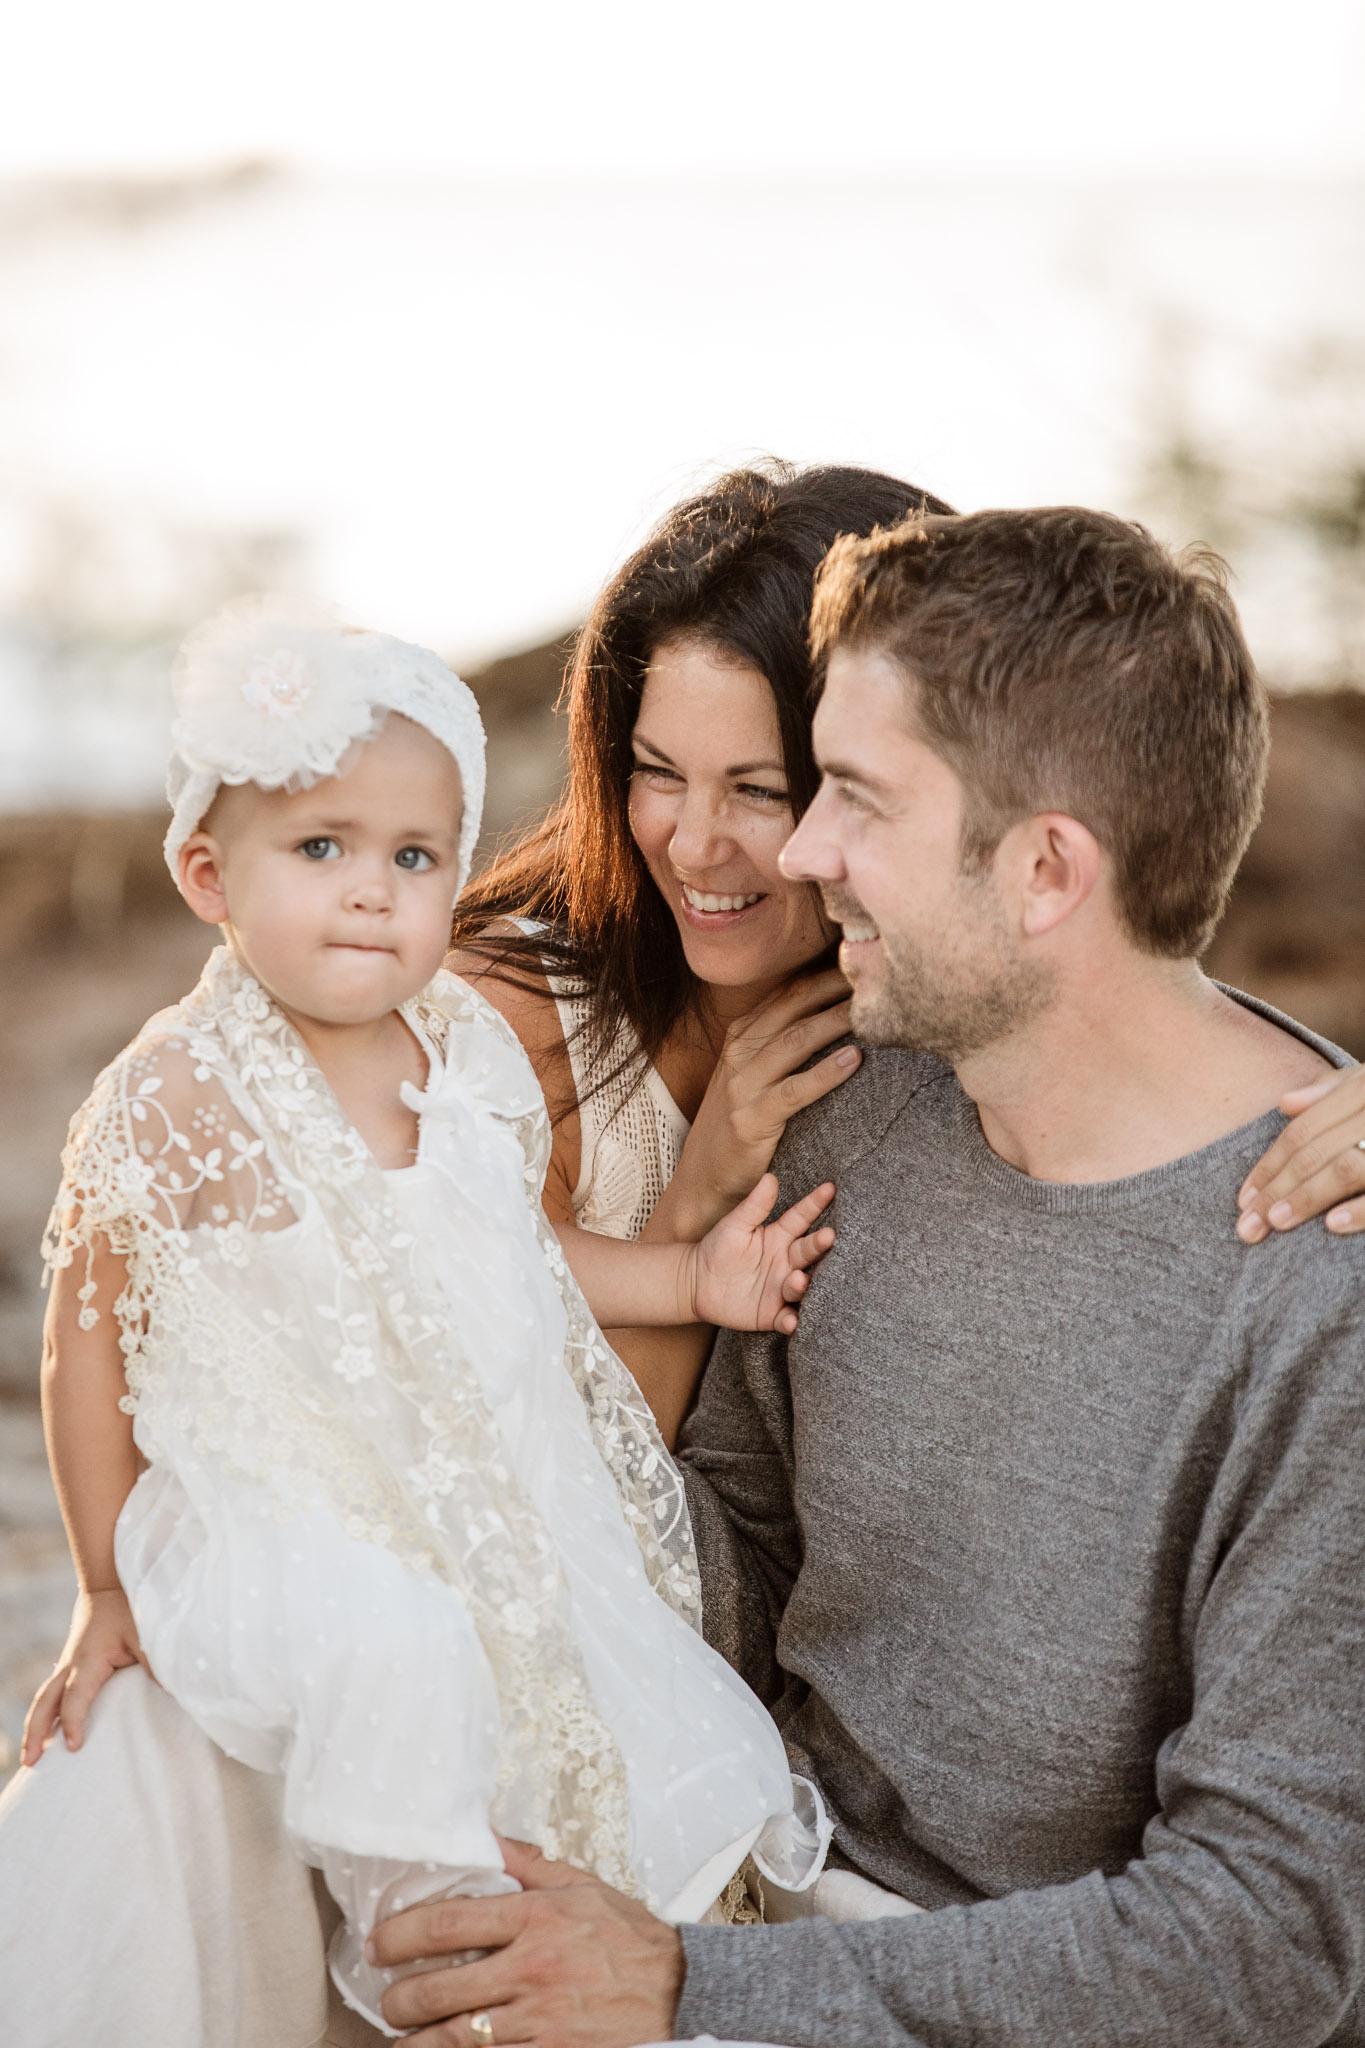 Mackay_Family_Sarasota_004.jpg